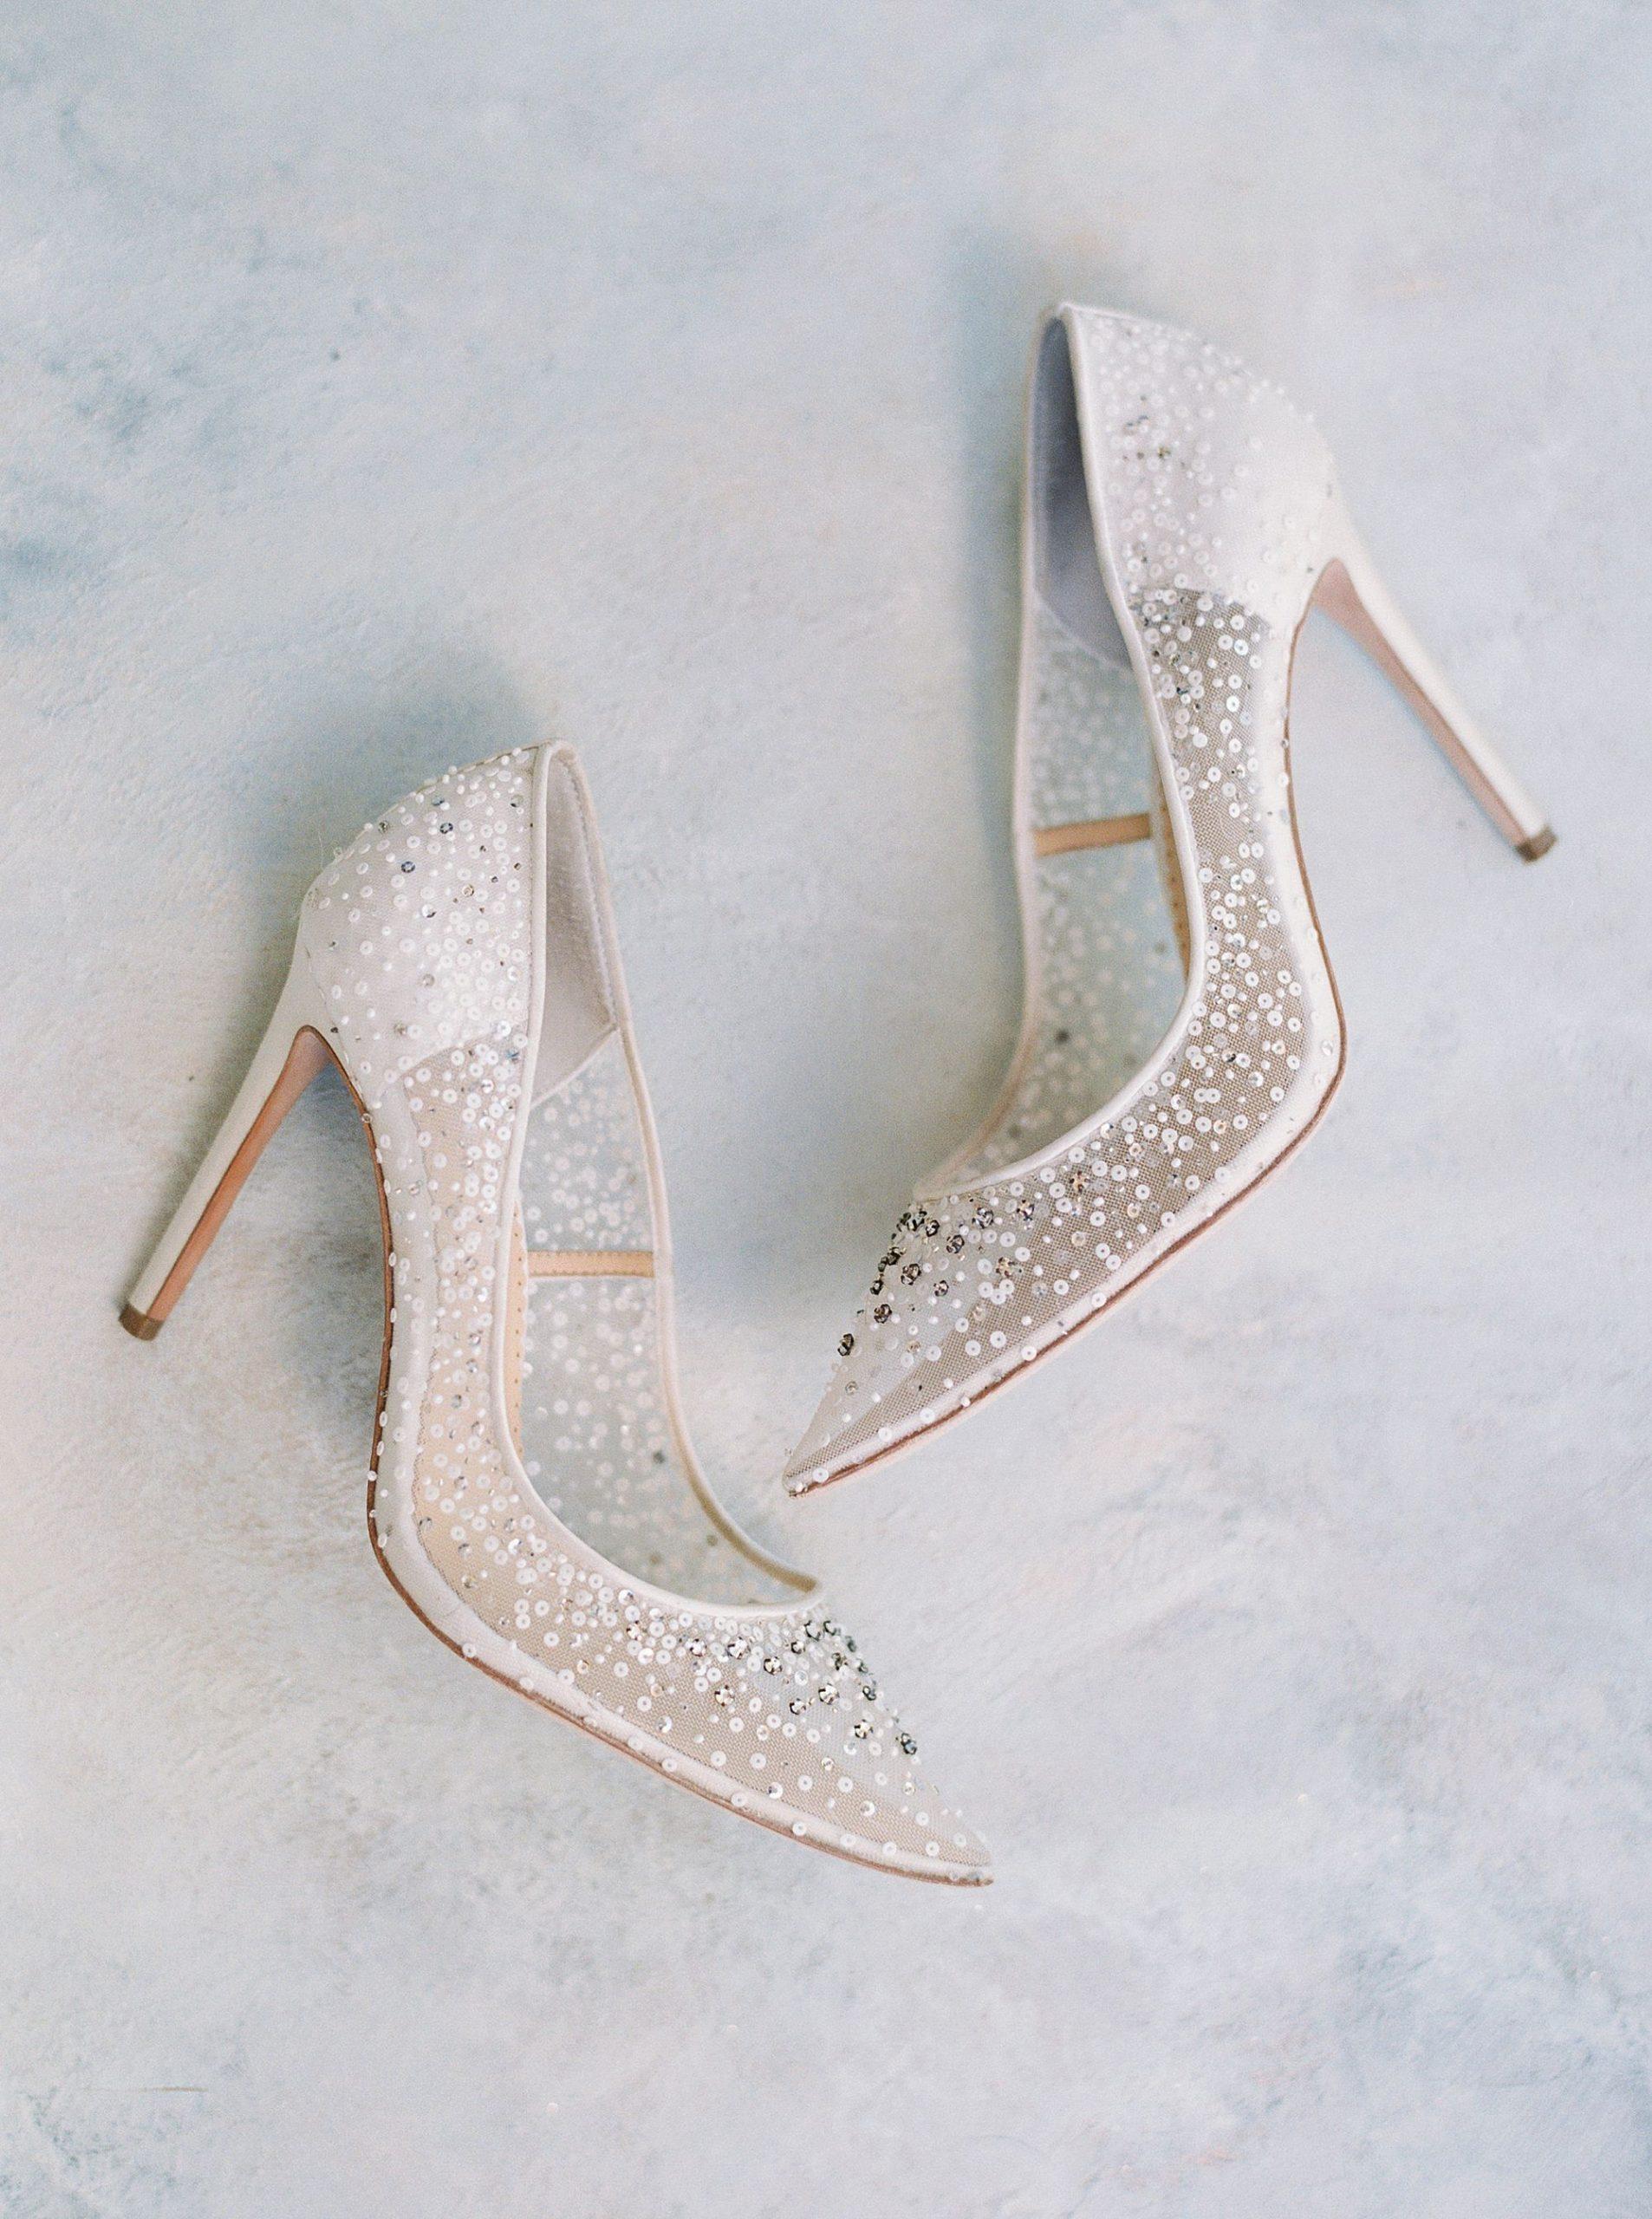 Park Winters Micro-Wedding Inspiration on Style Me Pretty - Stephanie Teague Events - Ashley Baumgartner - Park Winters Wedding - Black Tie Wedding - Micro-Wedding Sacramento Photographer_0028.jpg